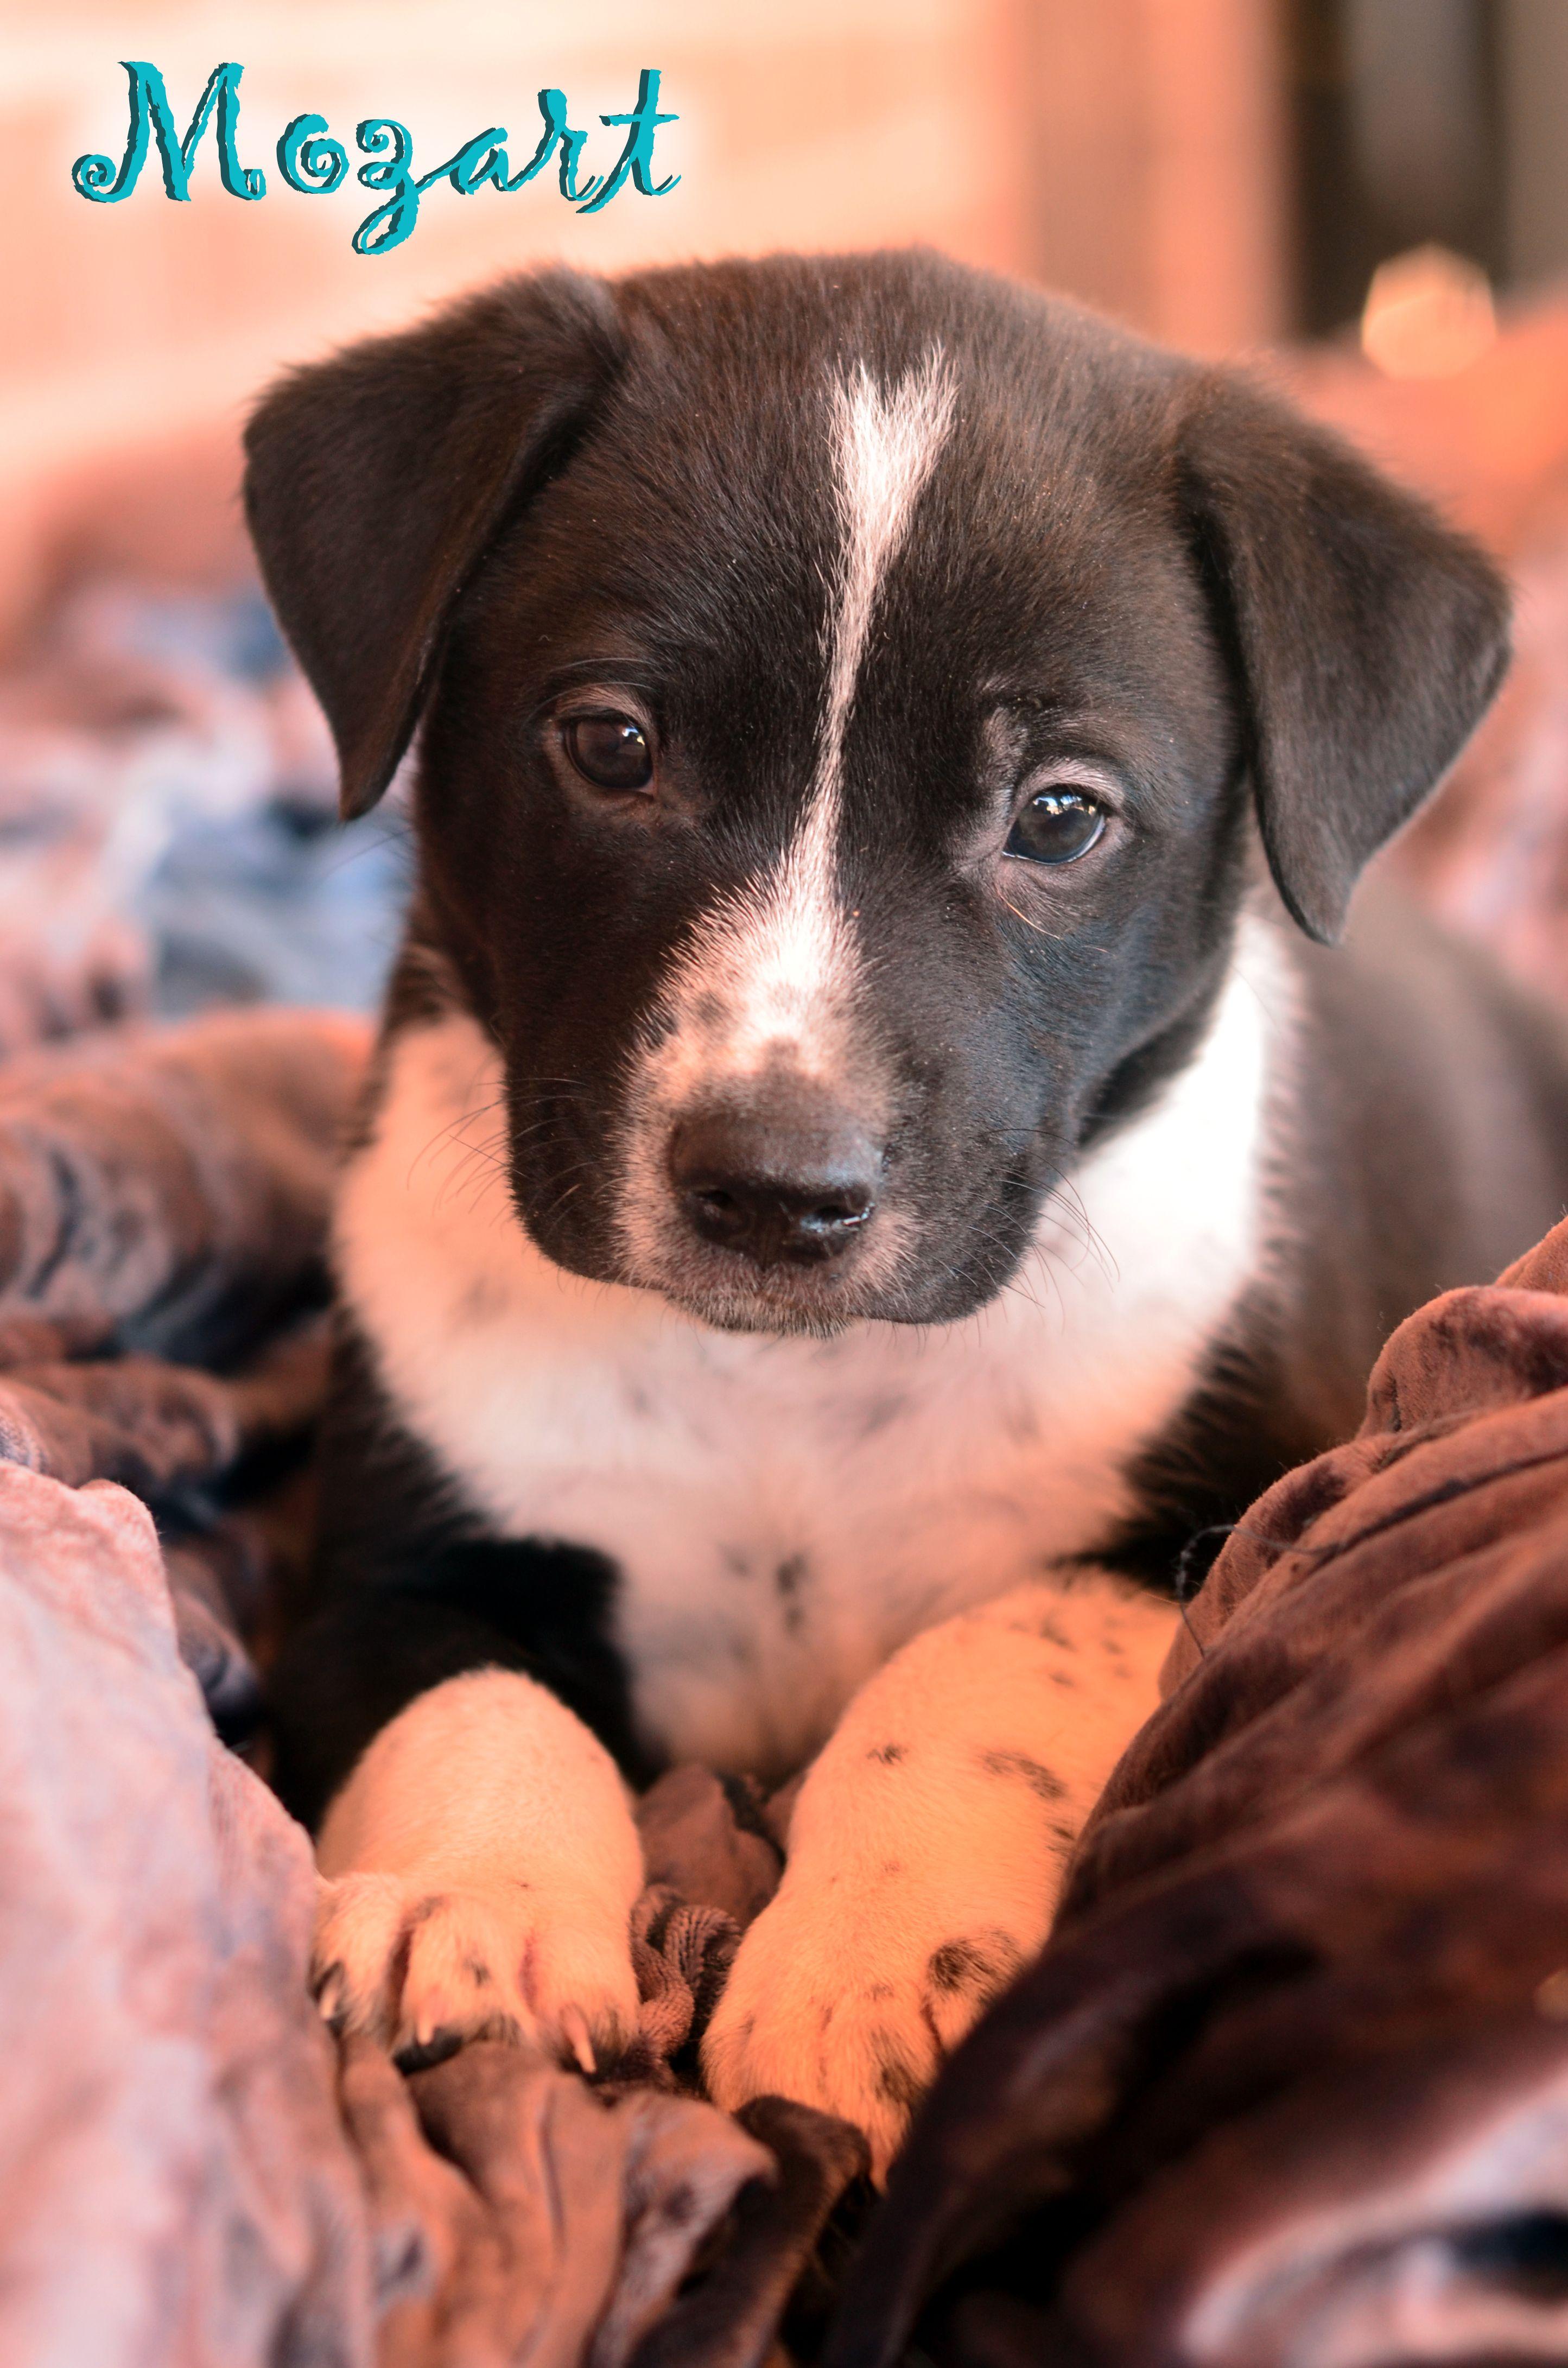 Labrador Retriever Dog For Adoption In Tucson Az Adn 803663 On Puppyfinder Com Gender Male Age Baby Dog Adoption Retriever Dog Labrador Retriever